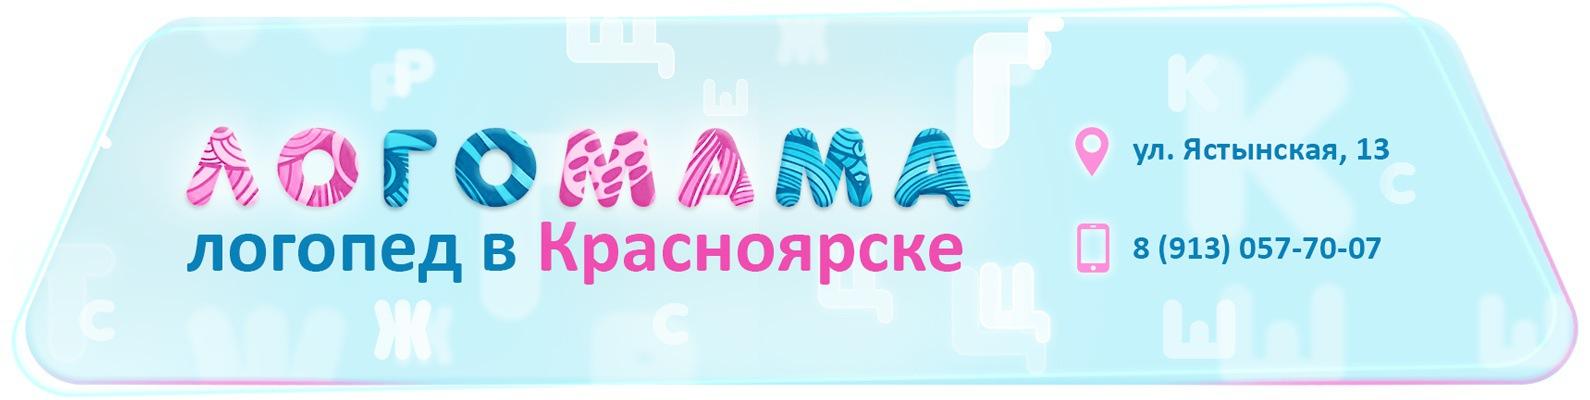 Хороший логопед красноярск